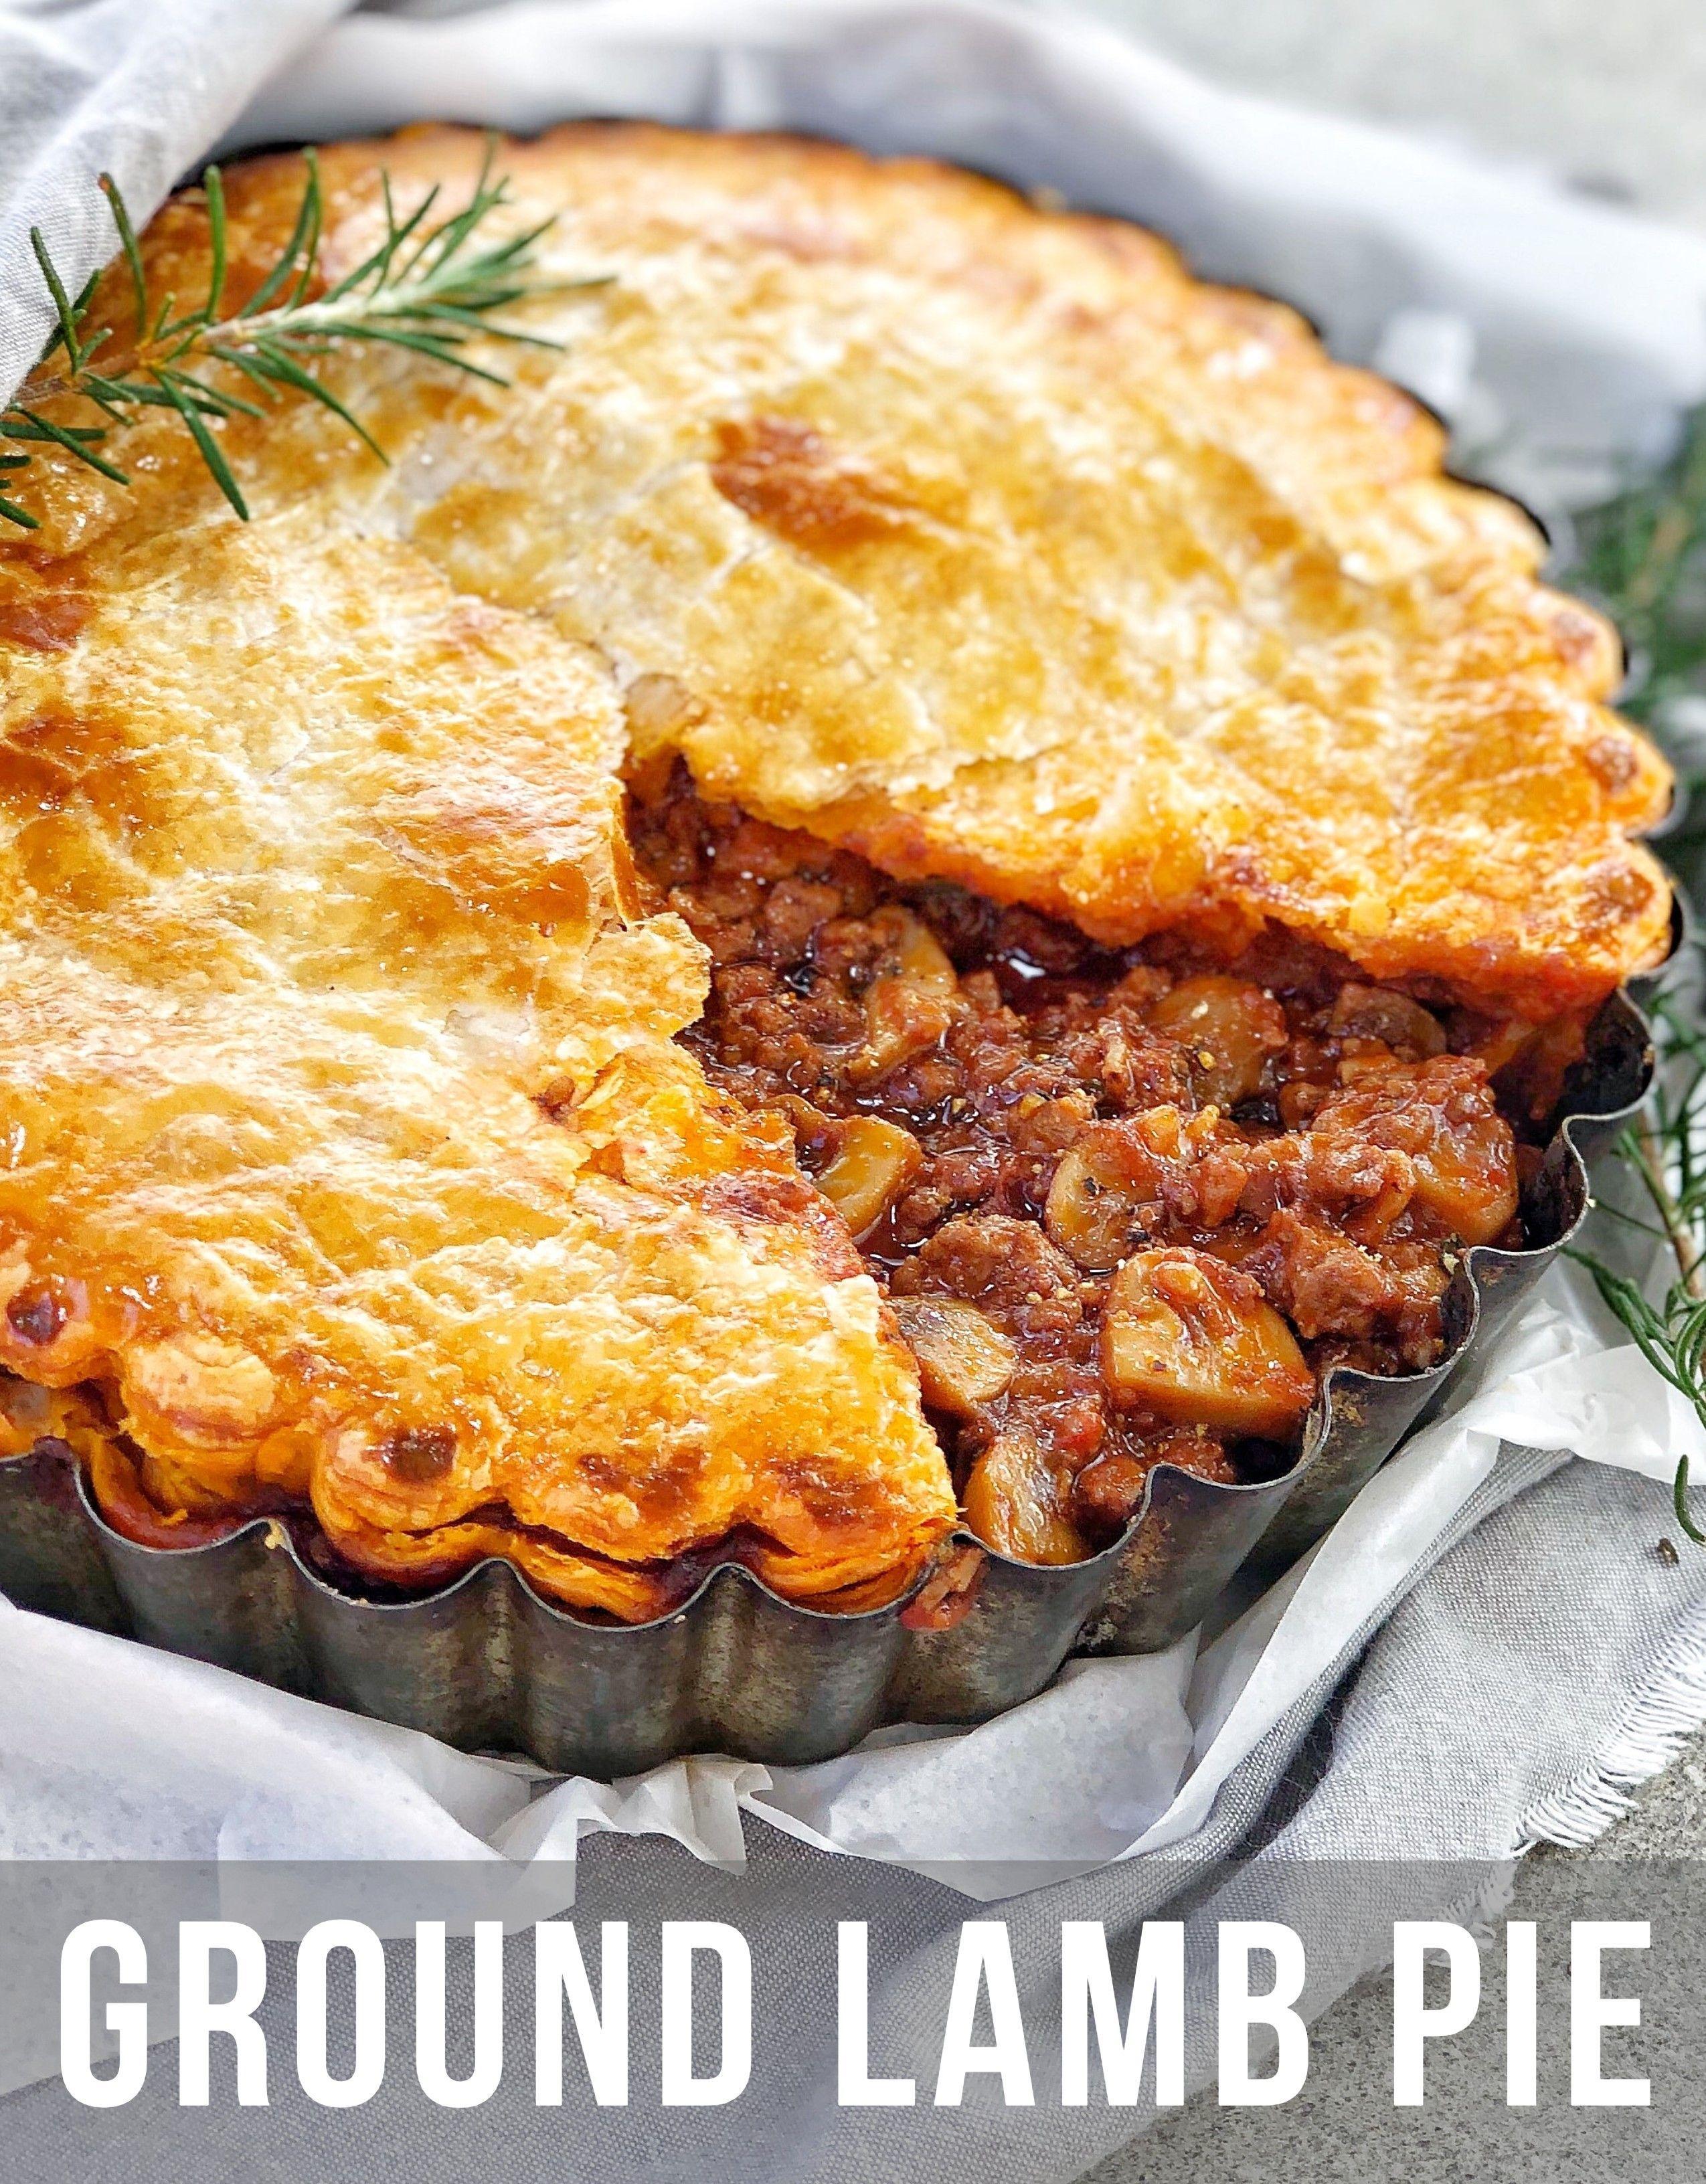 Lamb Pie In 2020 Lamb Pie Lamb Pie Recipes Lamb Mince Recipes